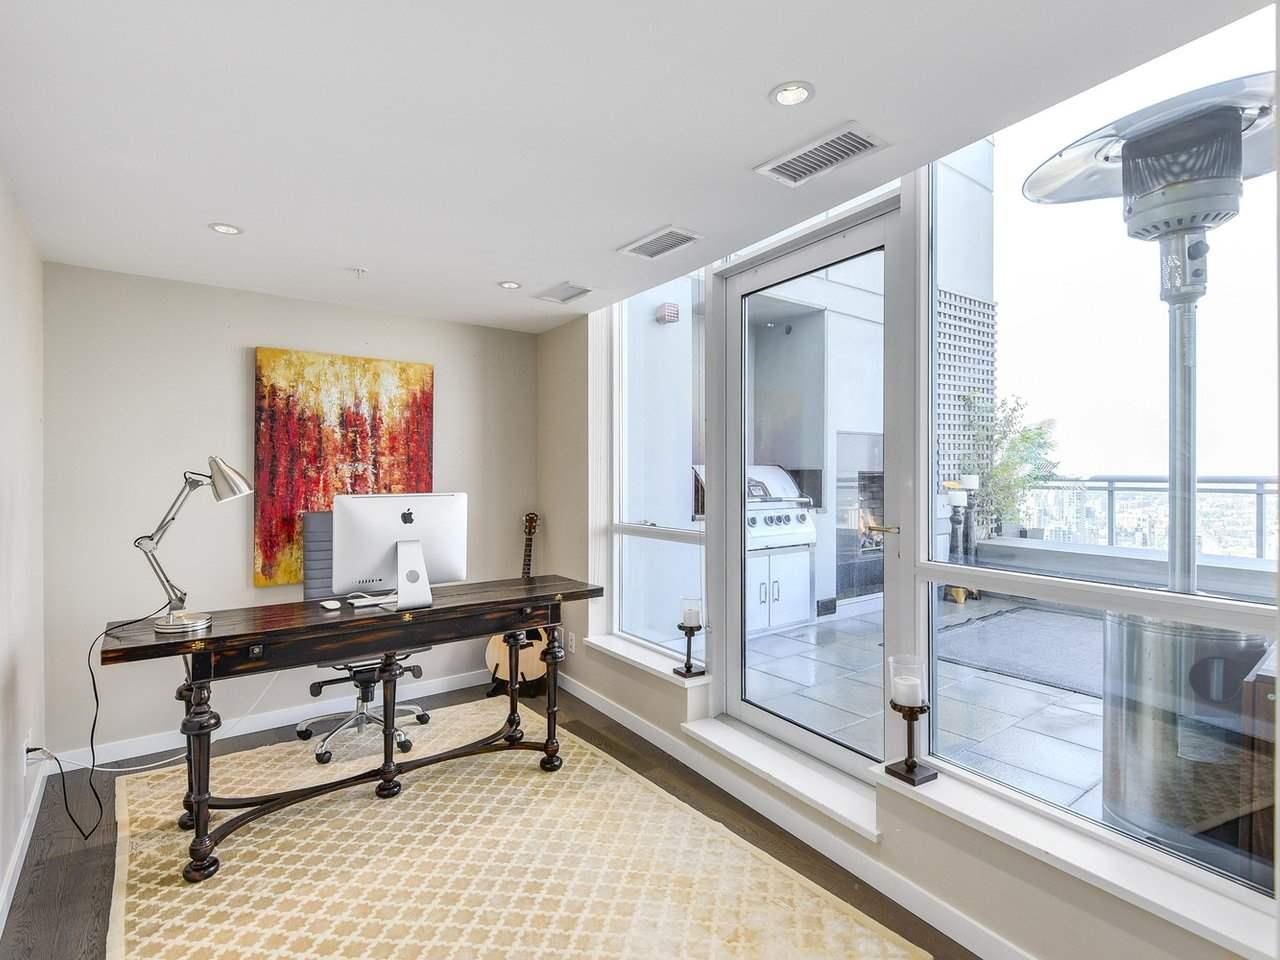 Condo Apartment at PH3 833 SEYMOUR STREET, Unit PH3, Vancouver West, British Columbia. Image 8